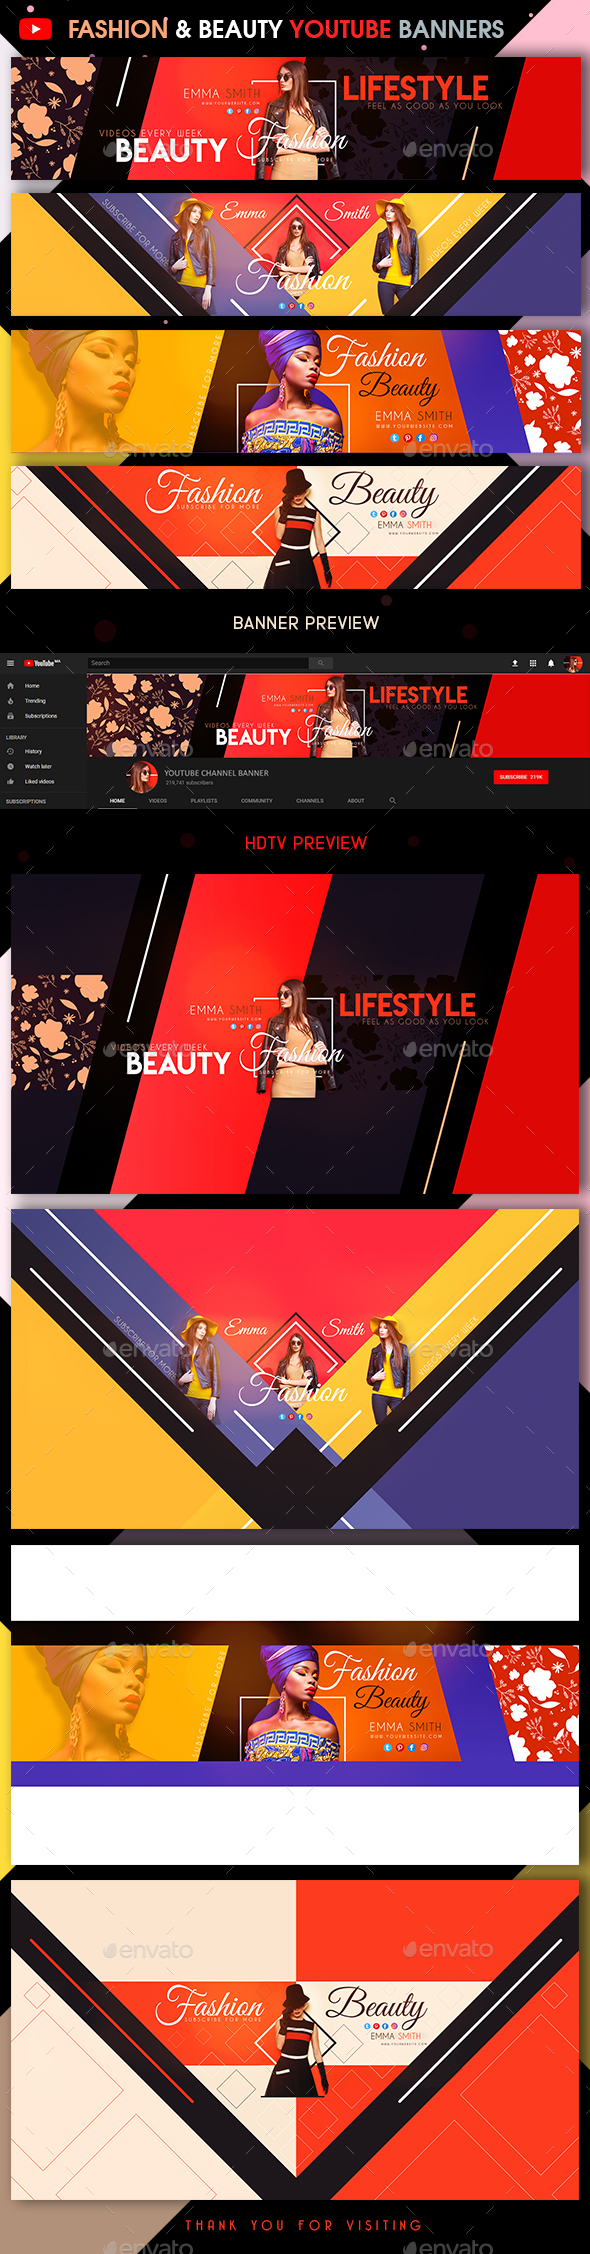 4 Fashion & Beauty YouTube Banners - YouTube Social Media